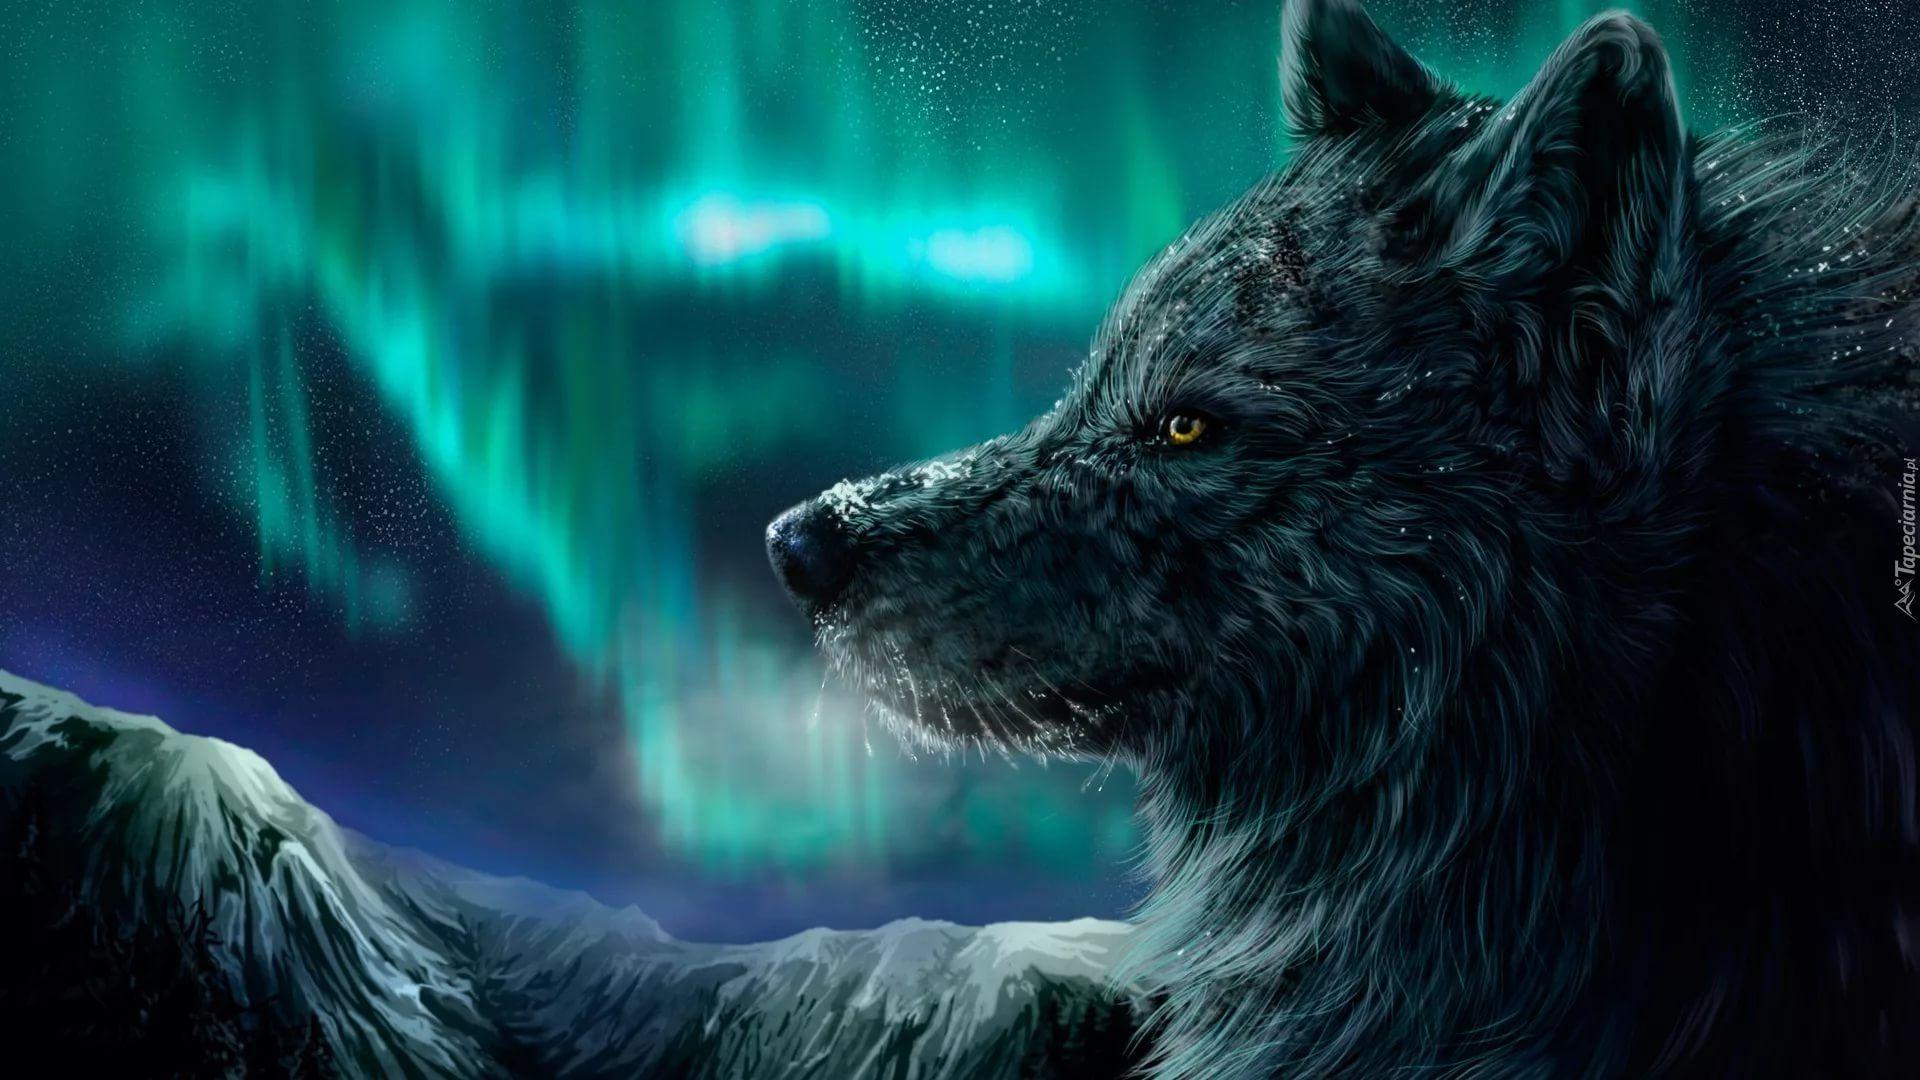 Cool Wolf hd wallpaper 1080